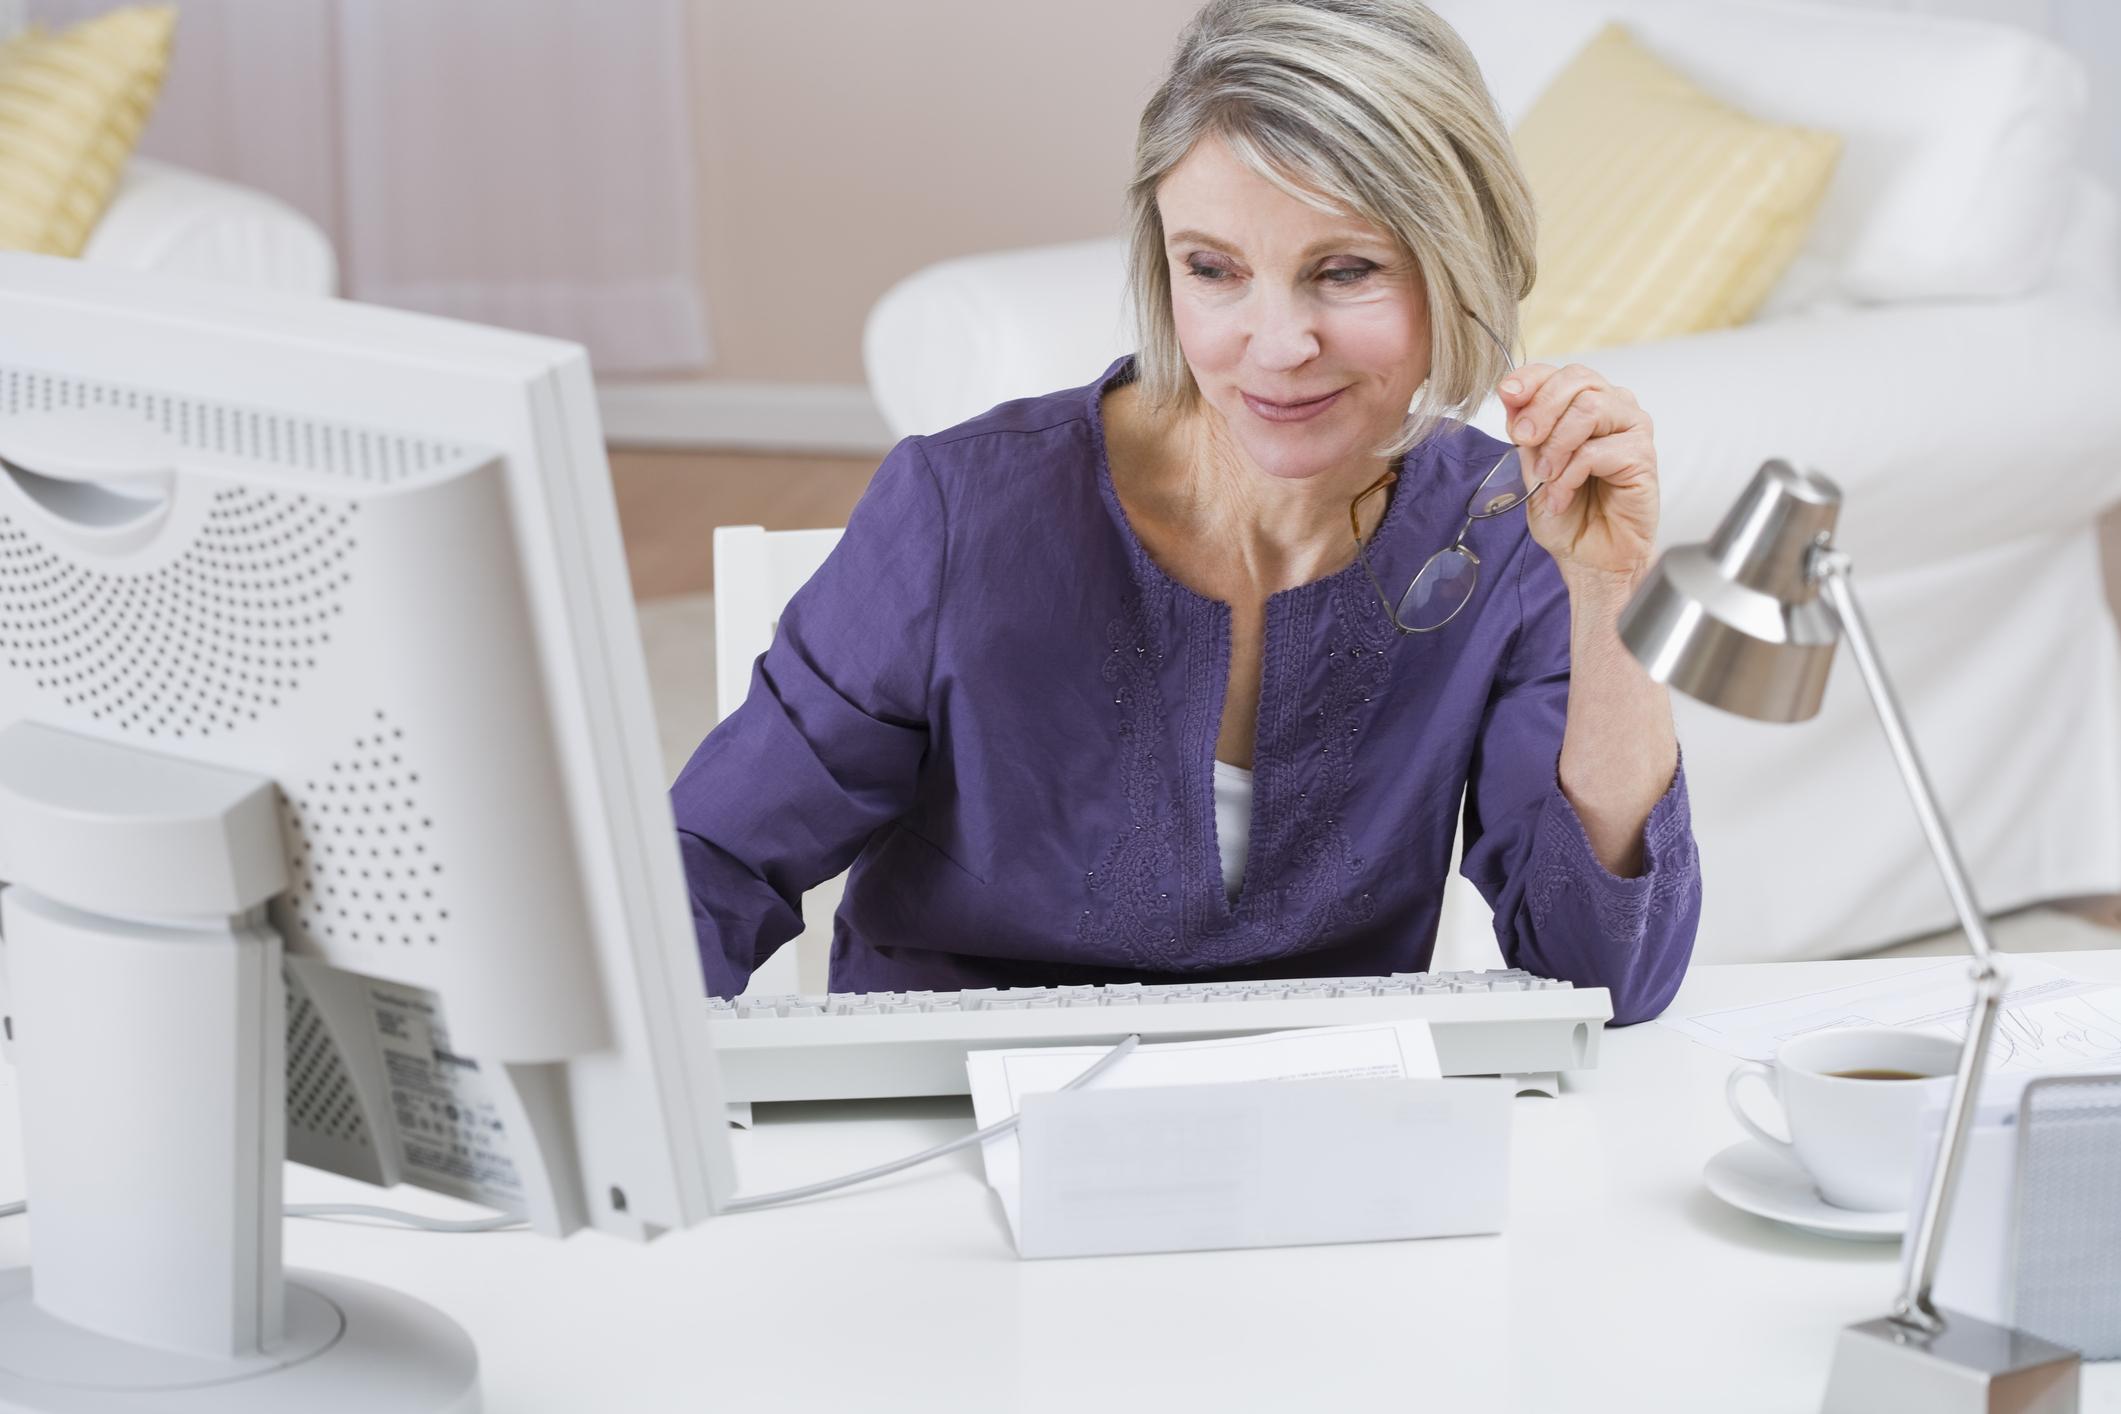 Woman reading a computer screen.